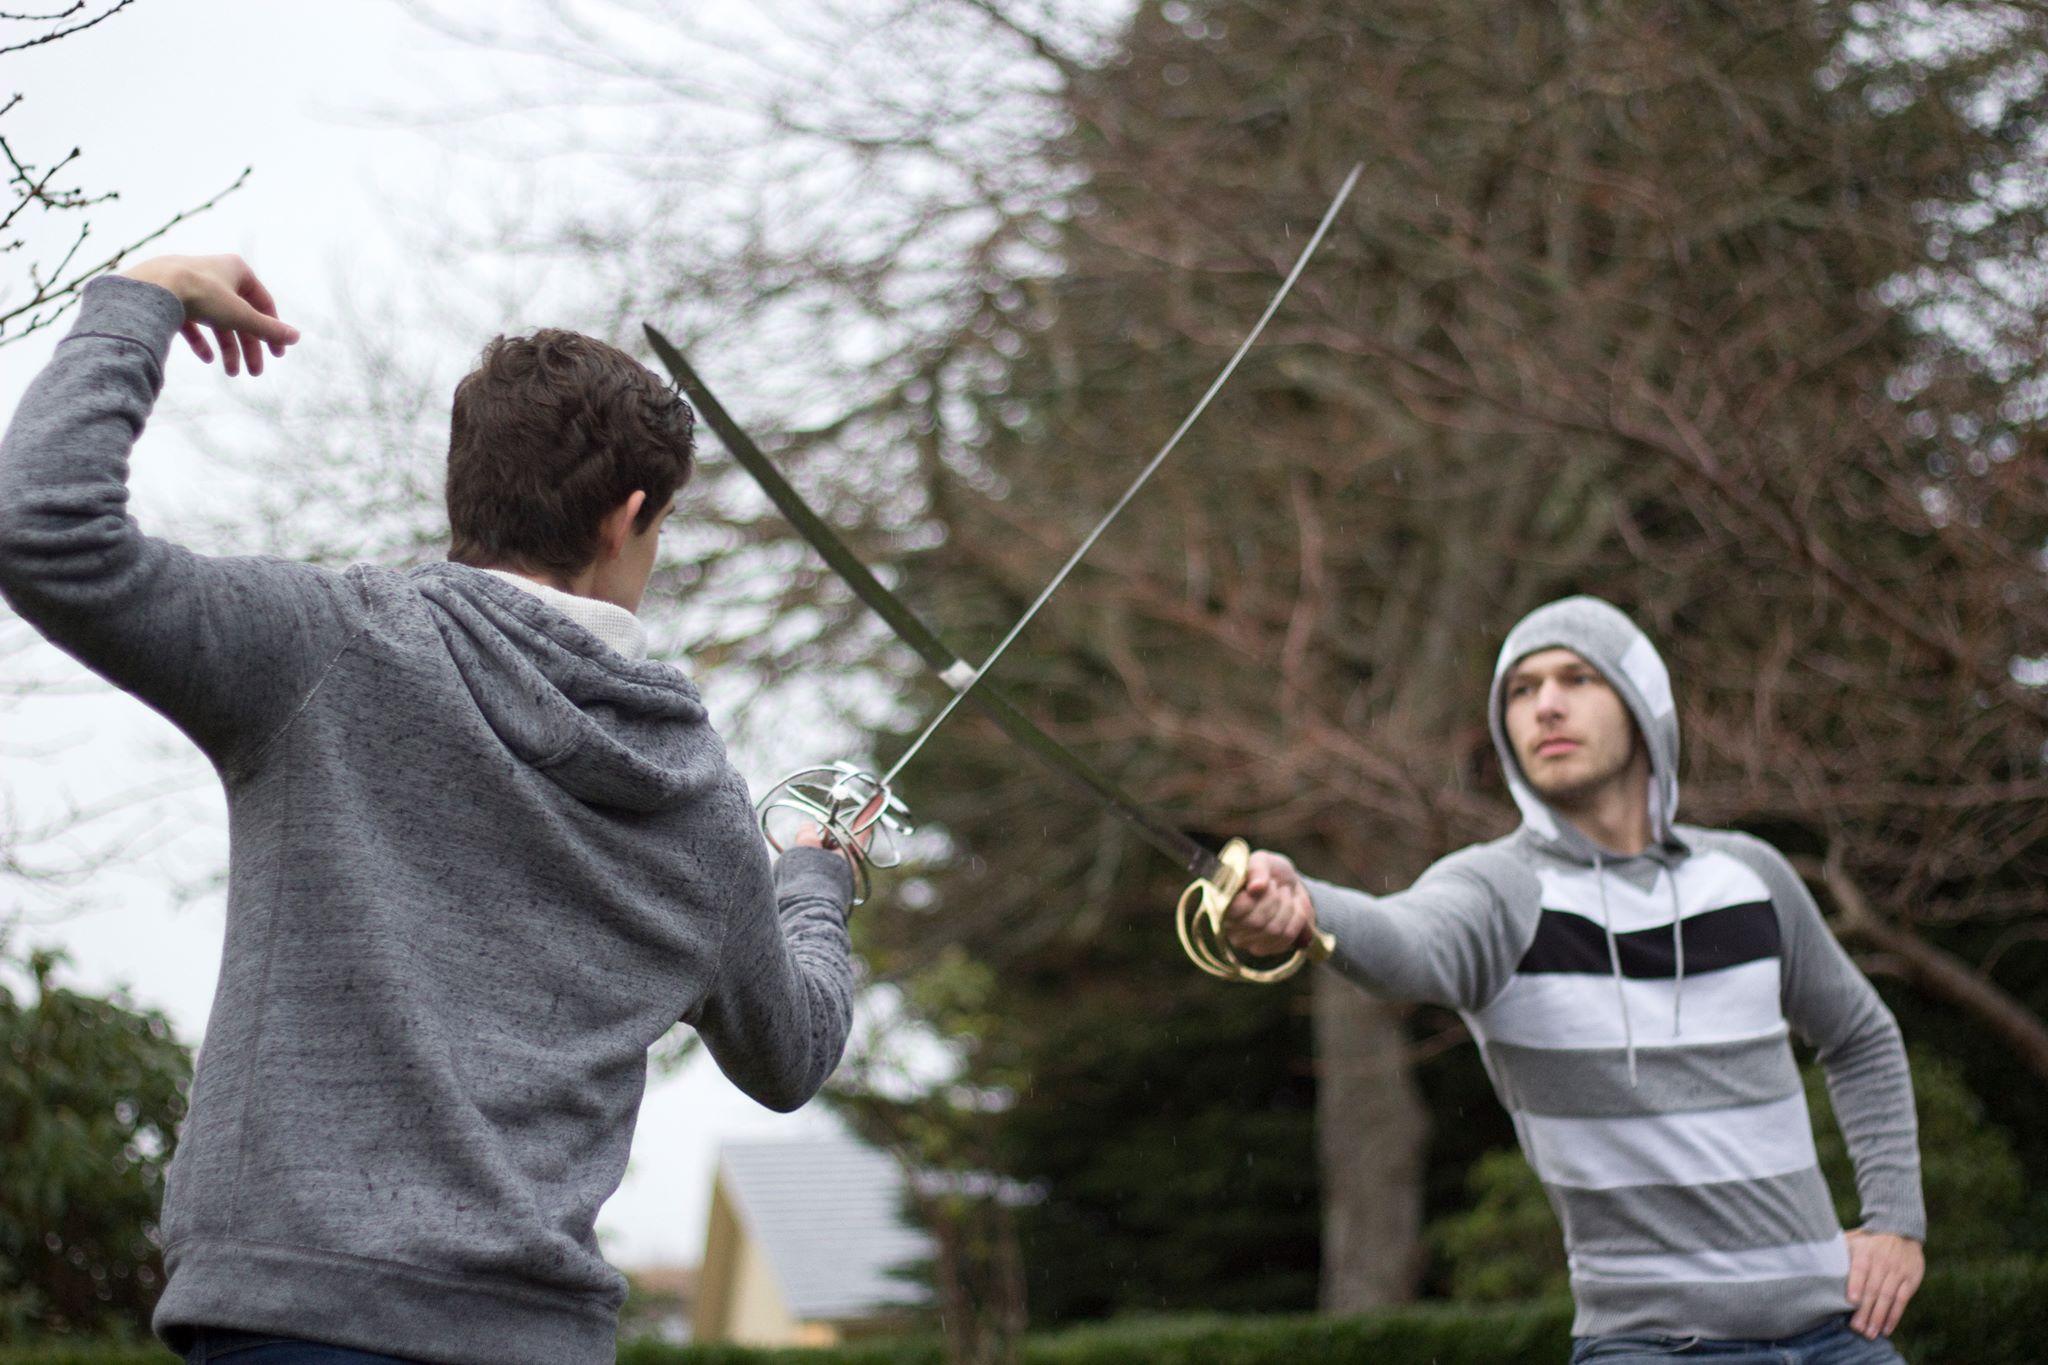 Sword practice at Manresa Castle